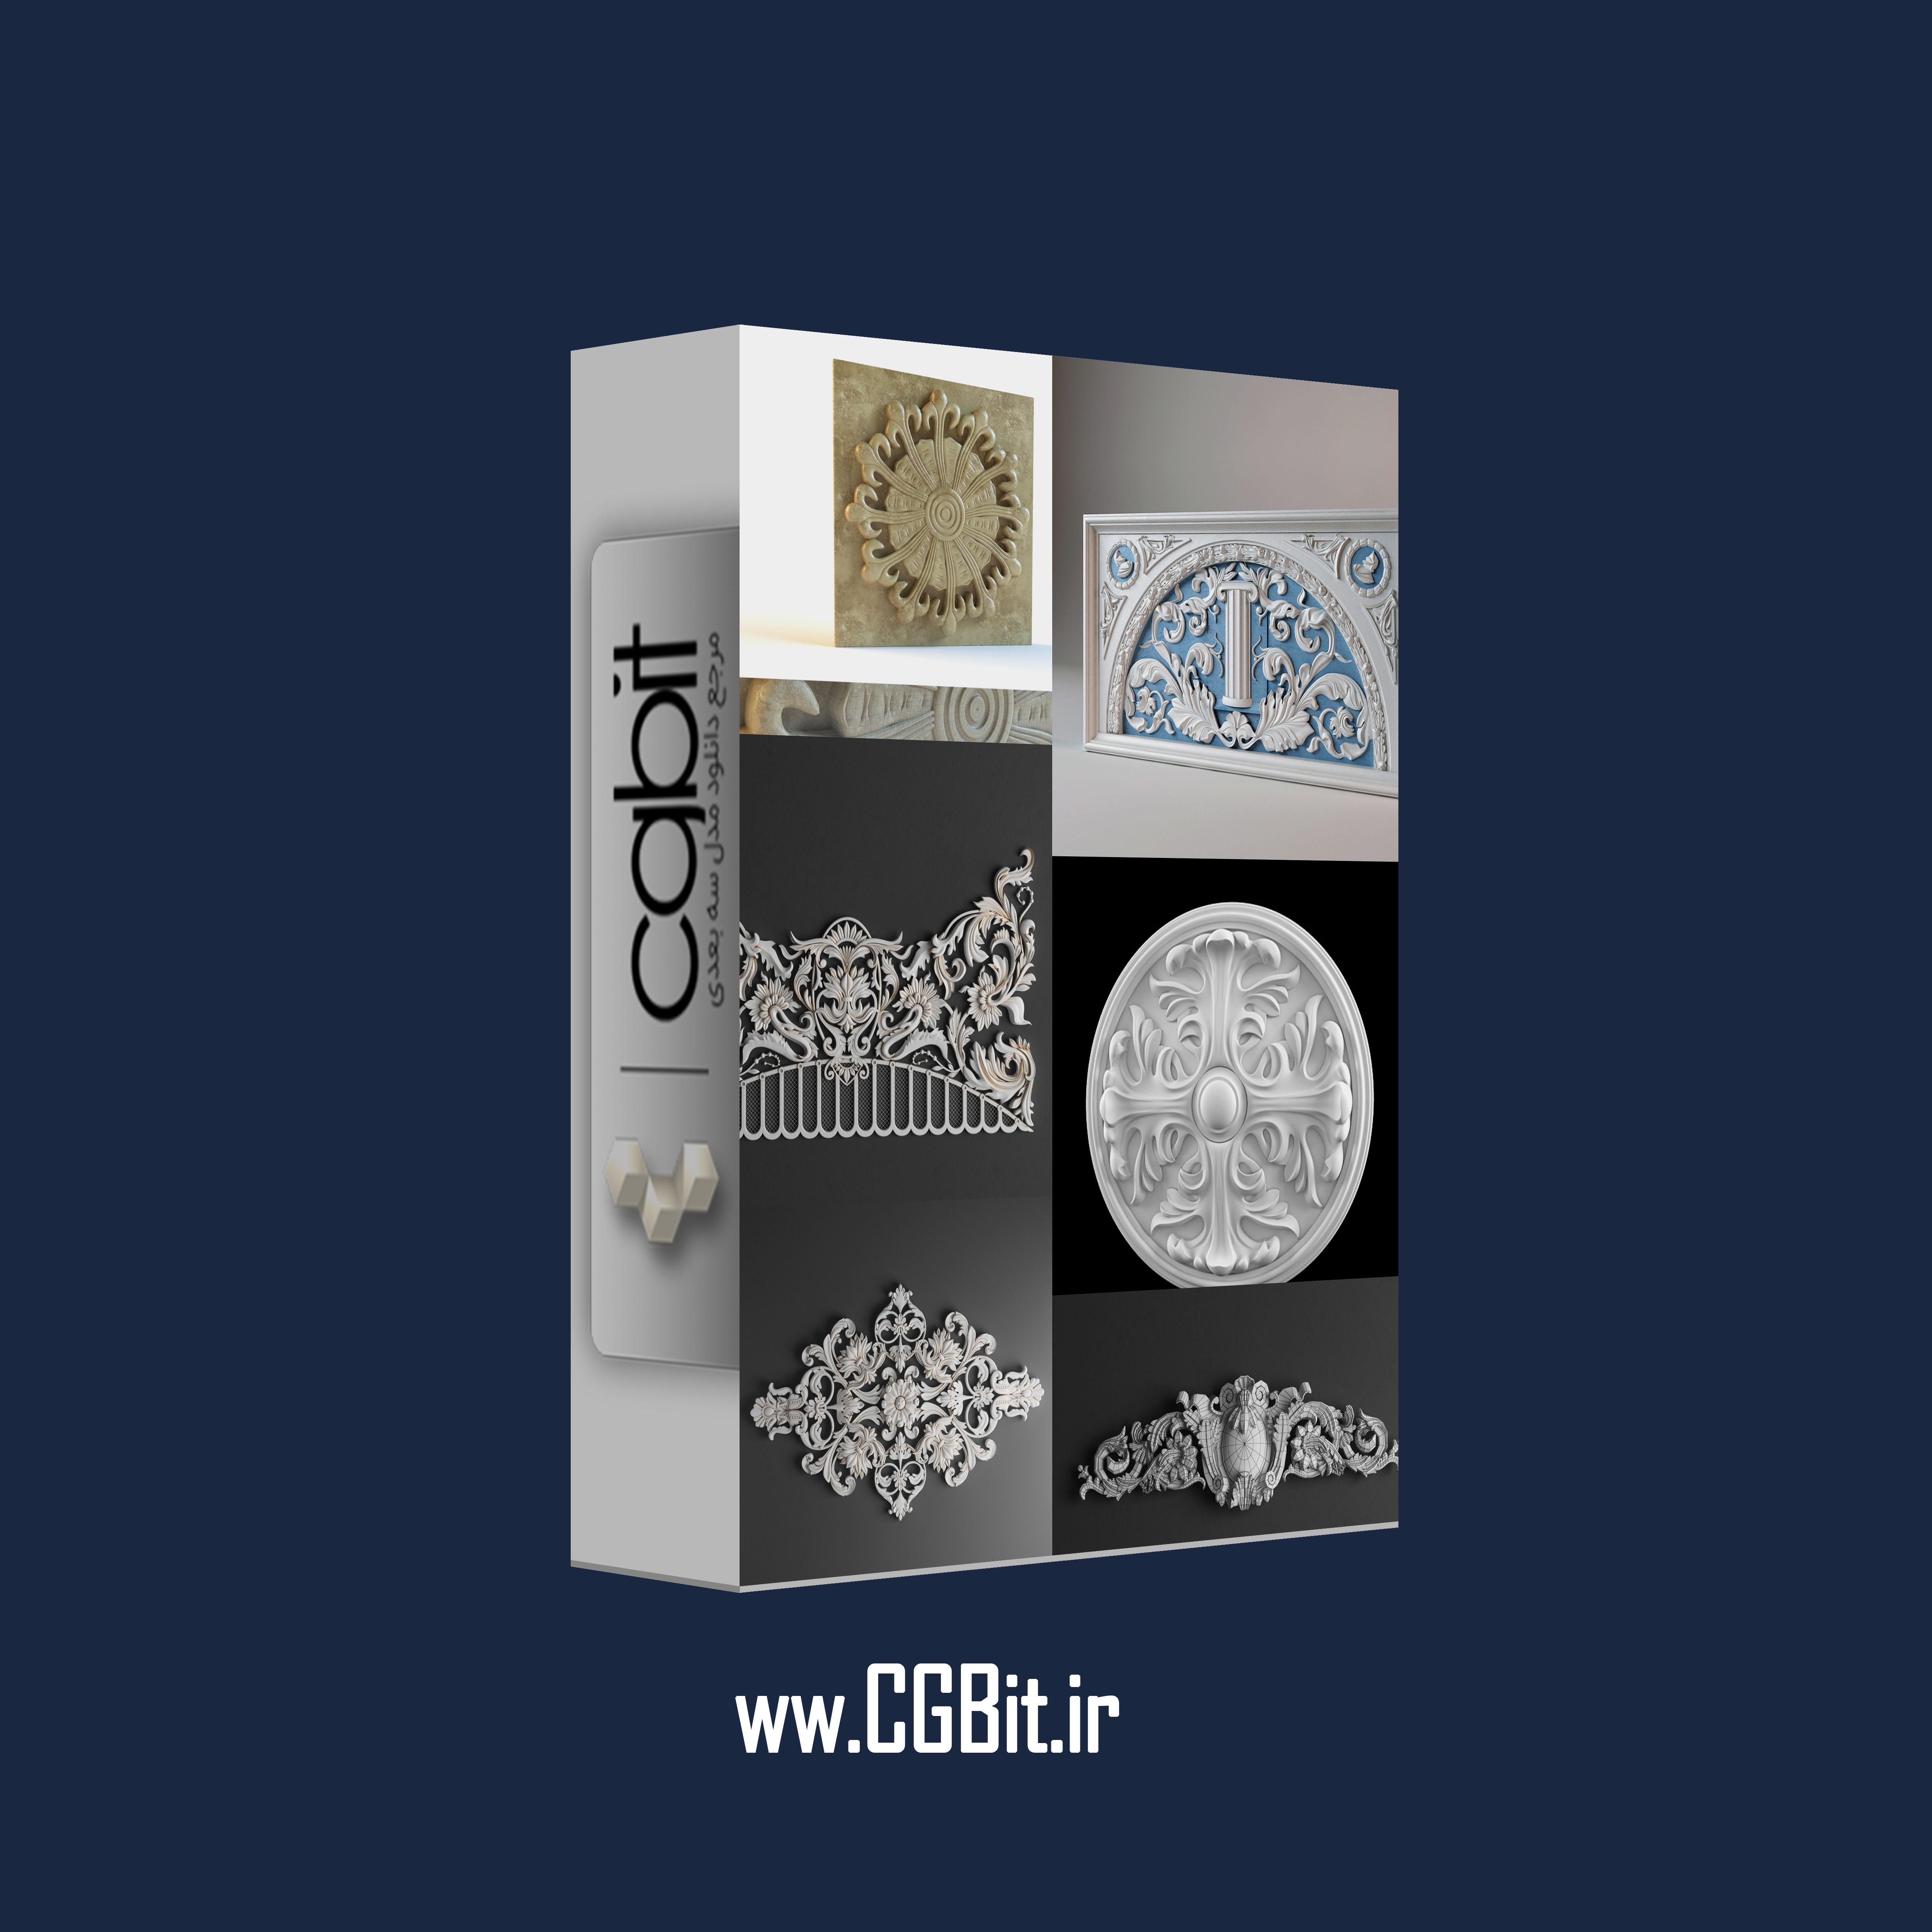 vz8h box scene2 - مجموعه مدل سه بعدی المانهای دکوراتیو کلاسیک